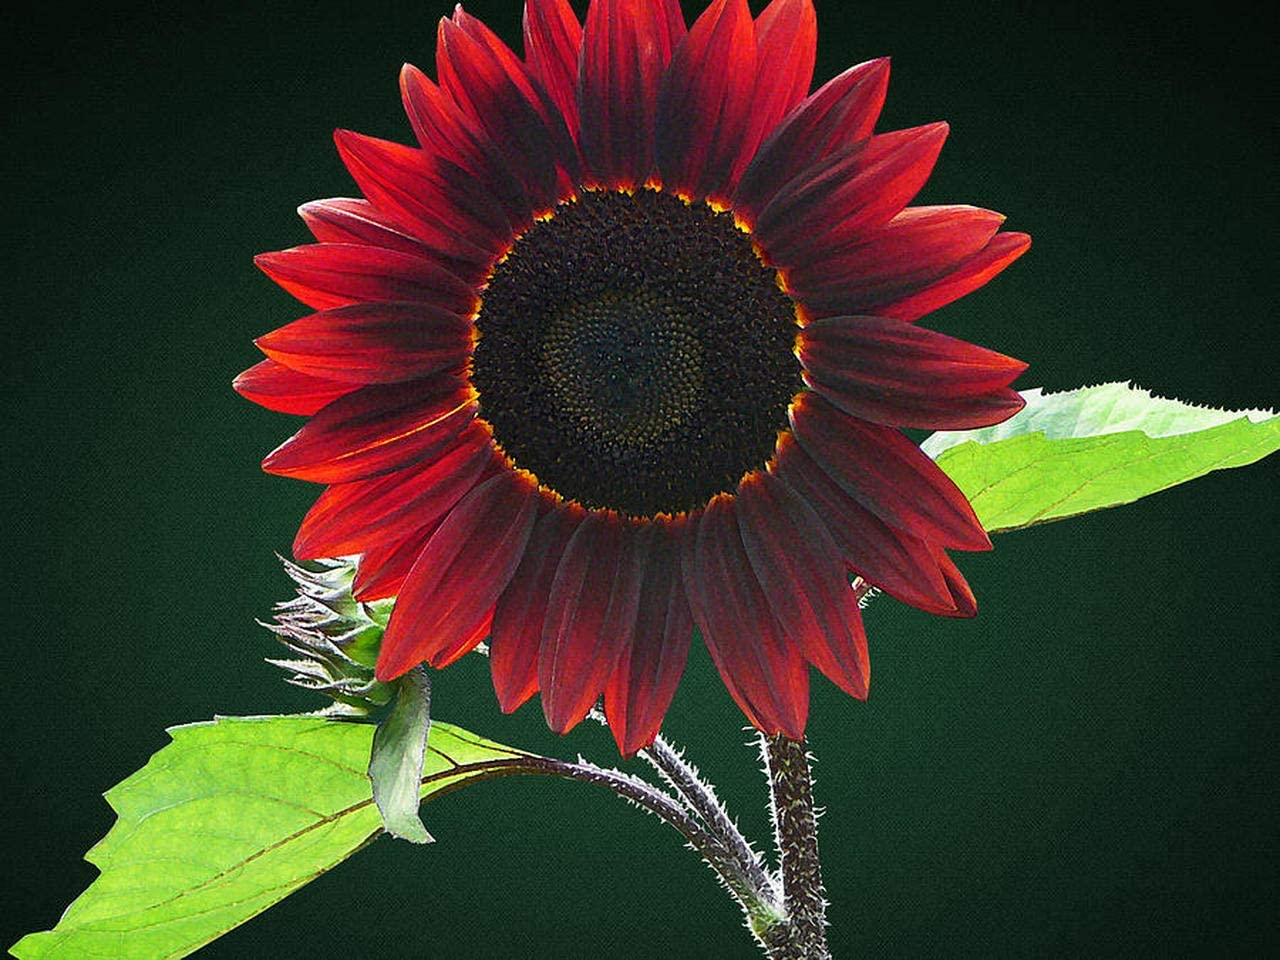 CZ Grain Chocolate Cherry Sunflower Seeds